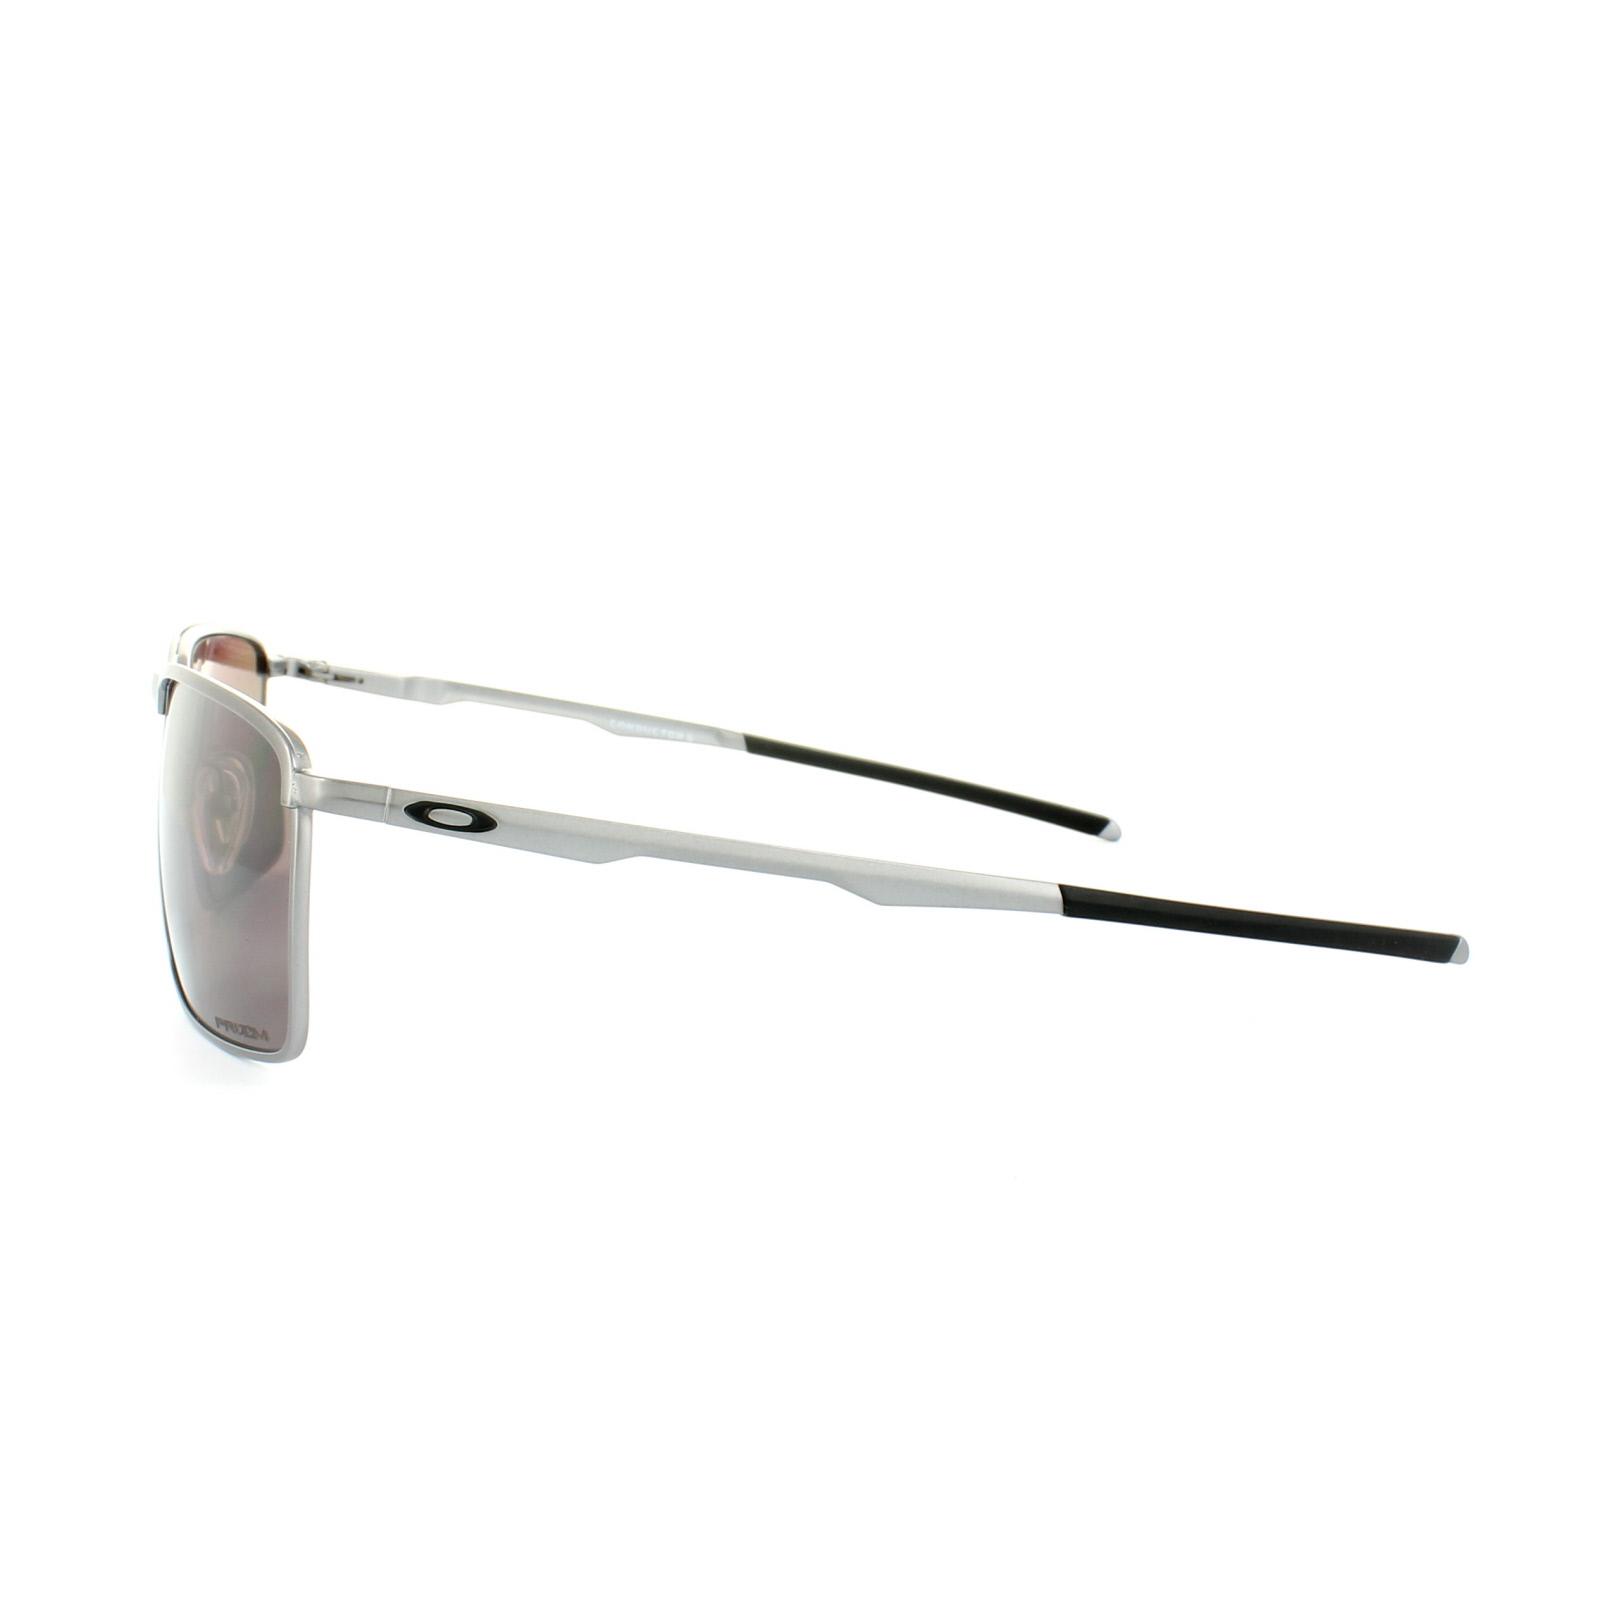 486cc99d15a Sentinel Oakley Sunglasses Conductor 6 OO4106-07 Lead Prizm Daily Polarized